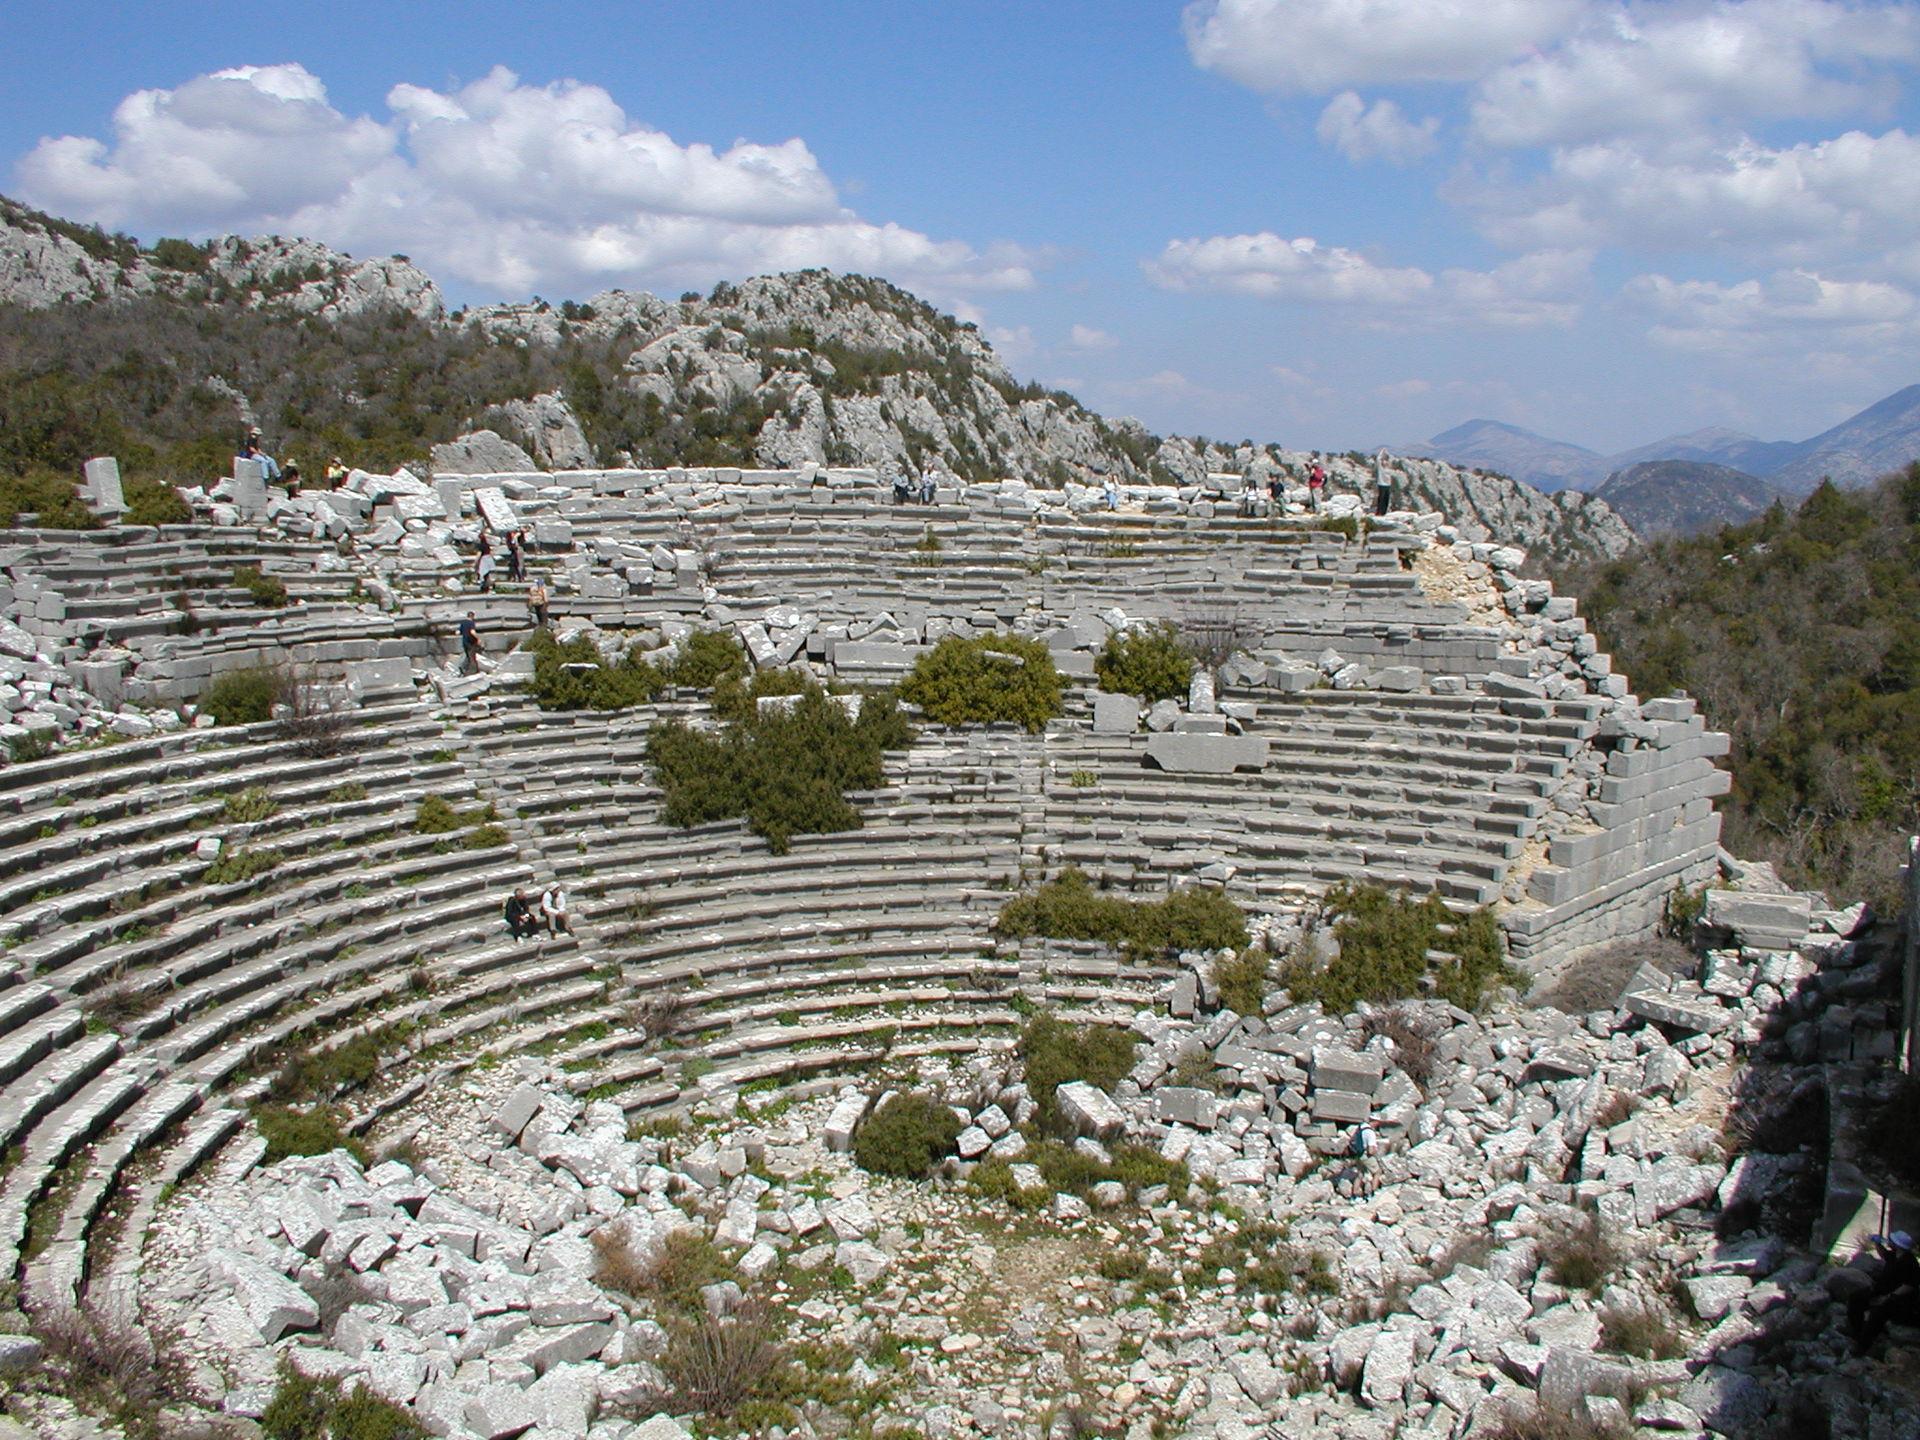 Termessos Theater / Bildquelle: http://bit.ly/ZMbco4